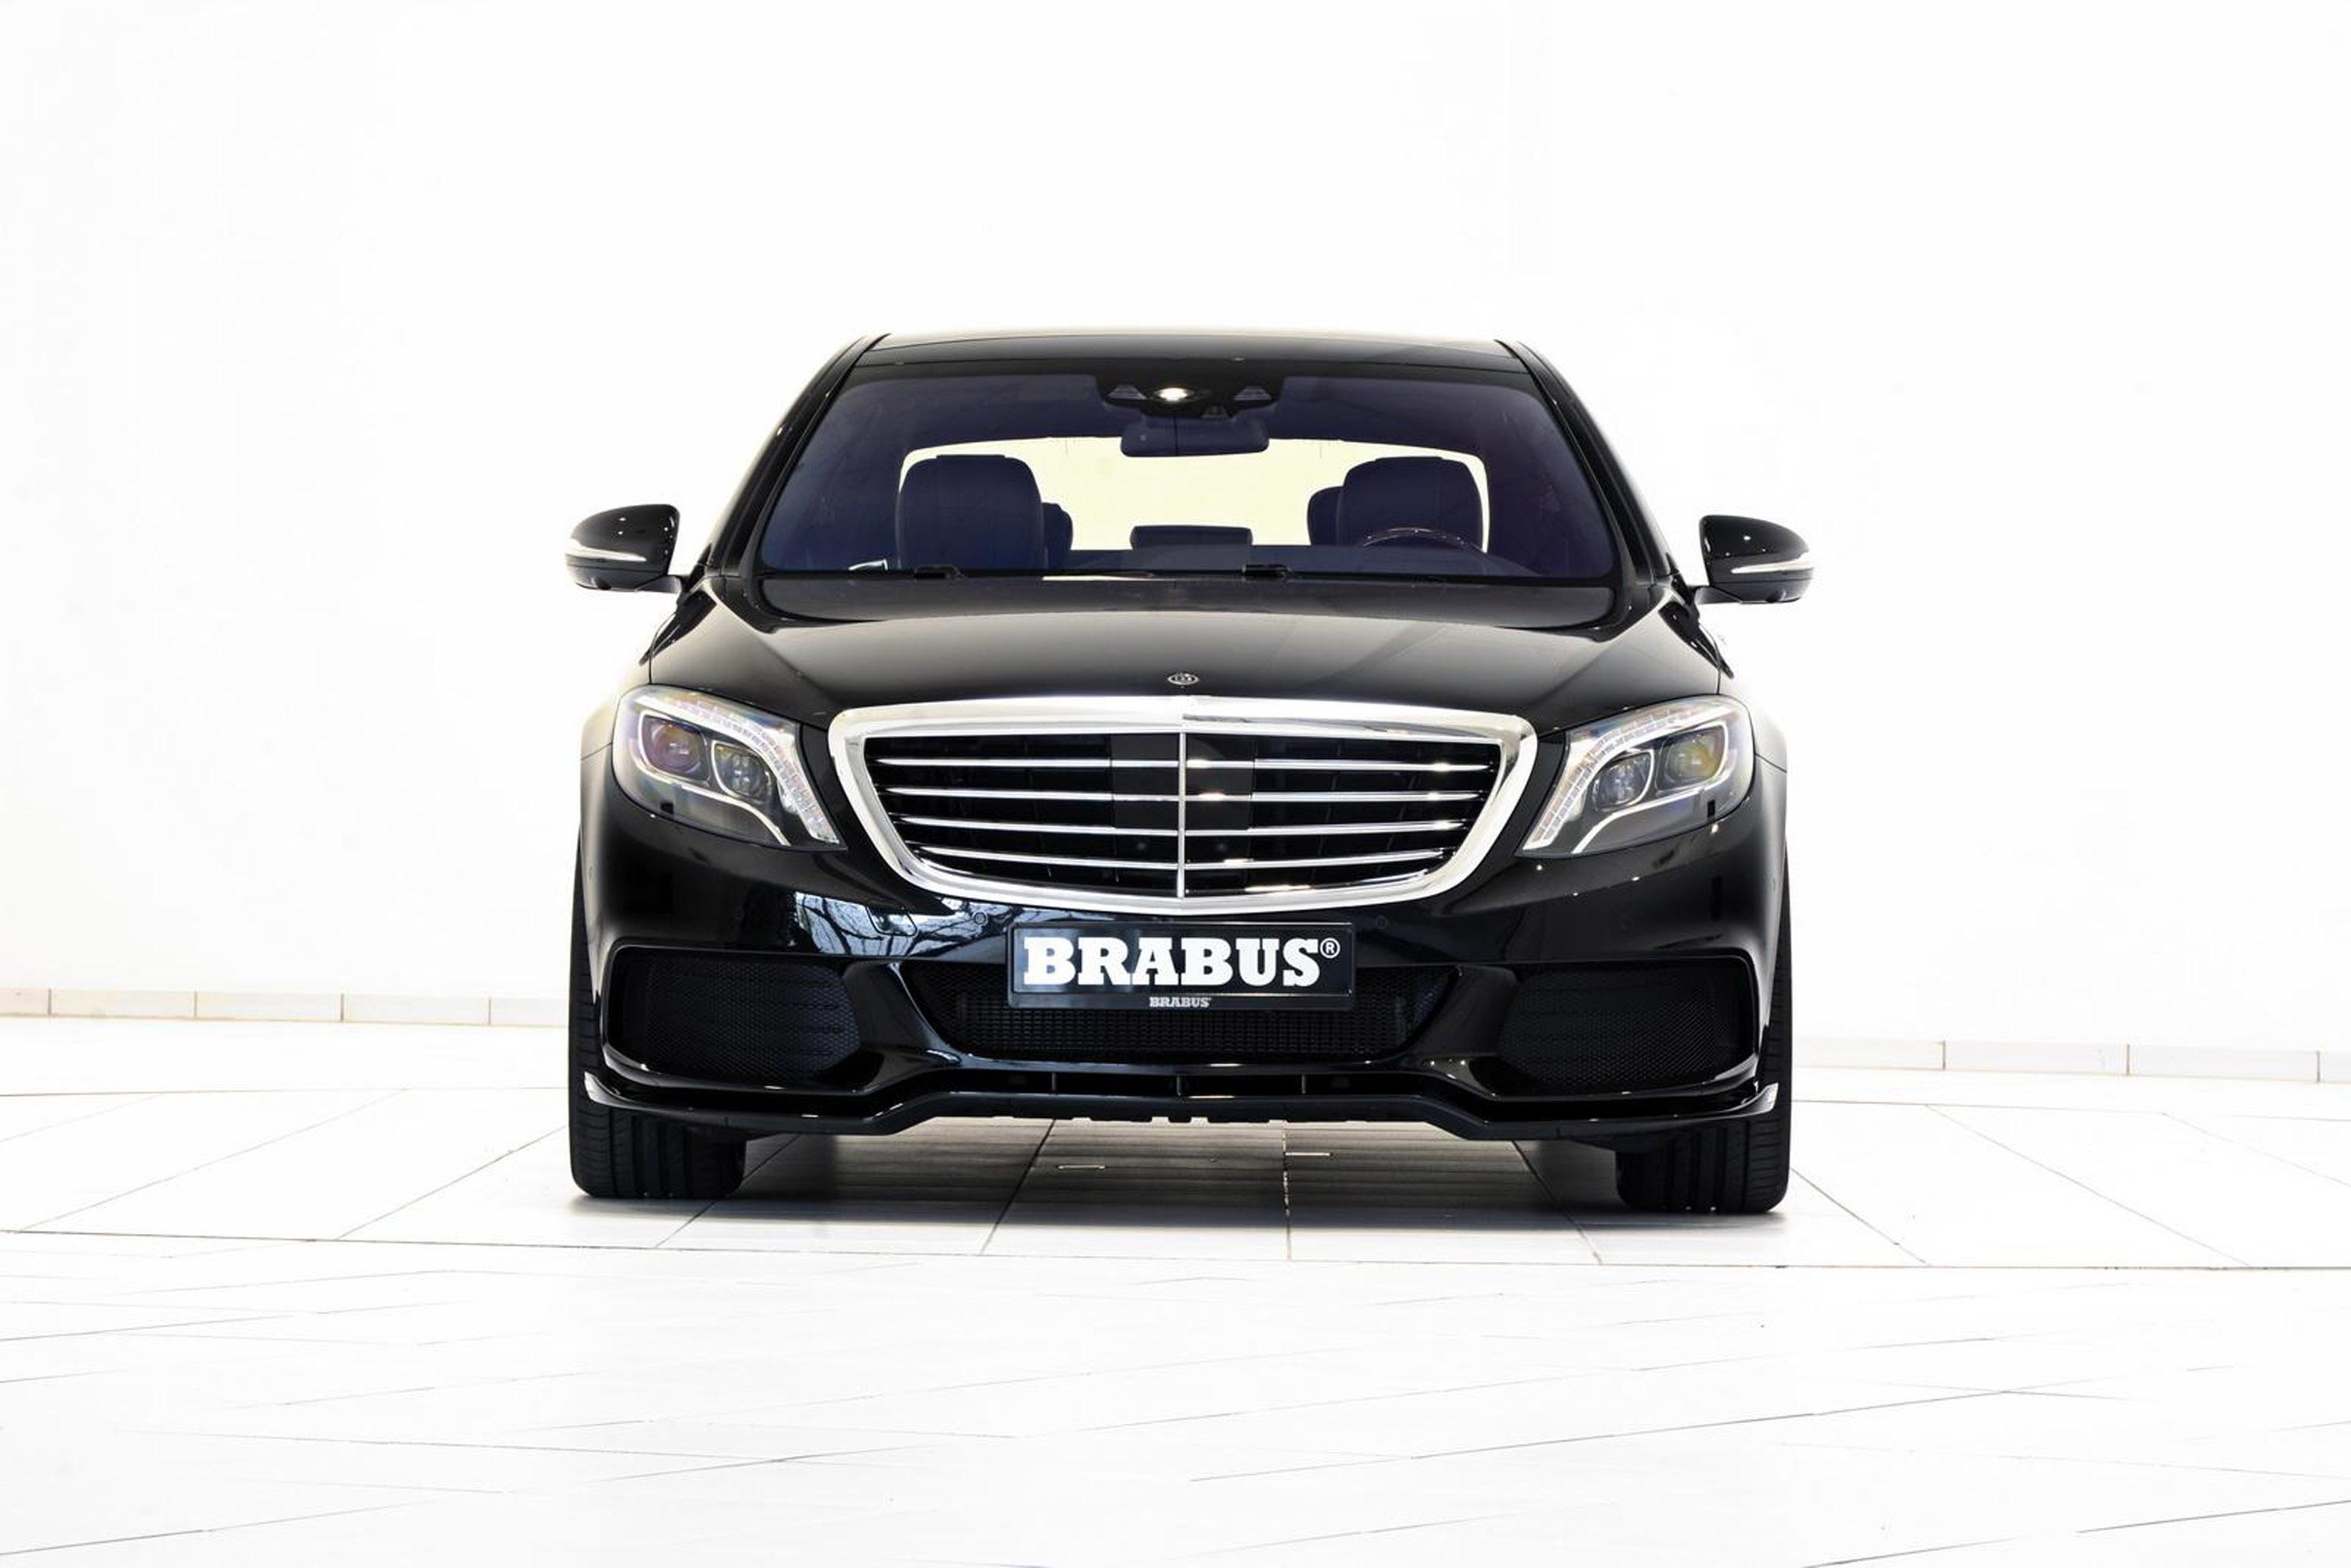 Index of /img/2015-brabus-mercedes-benz-s500-plug-in-hybrid